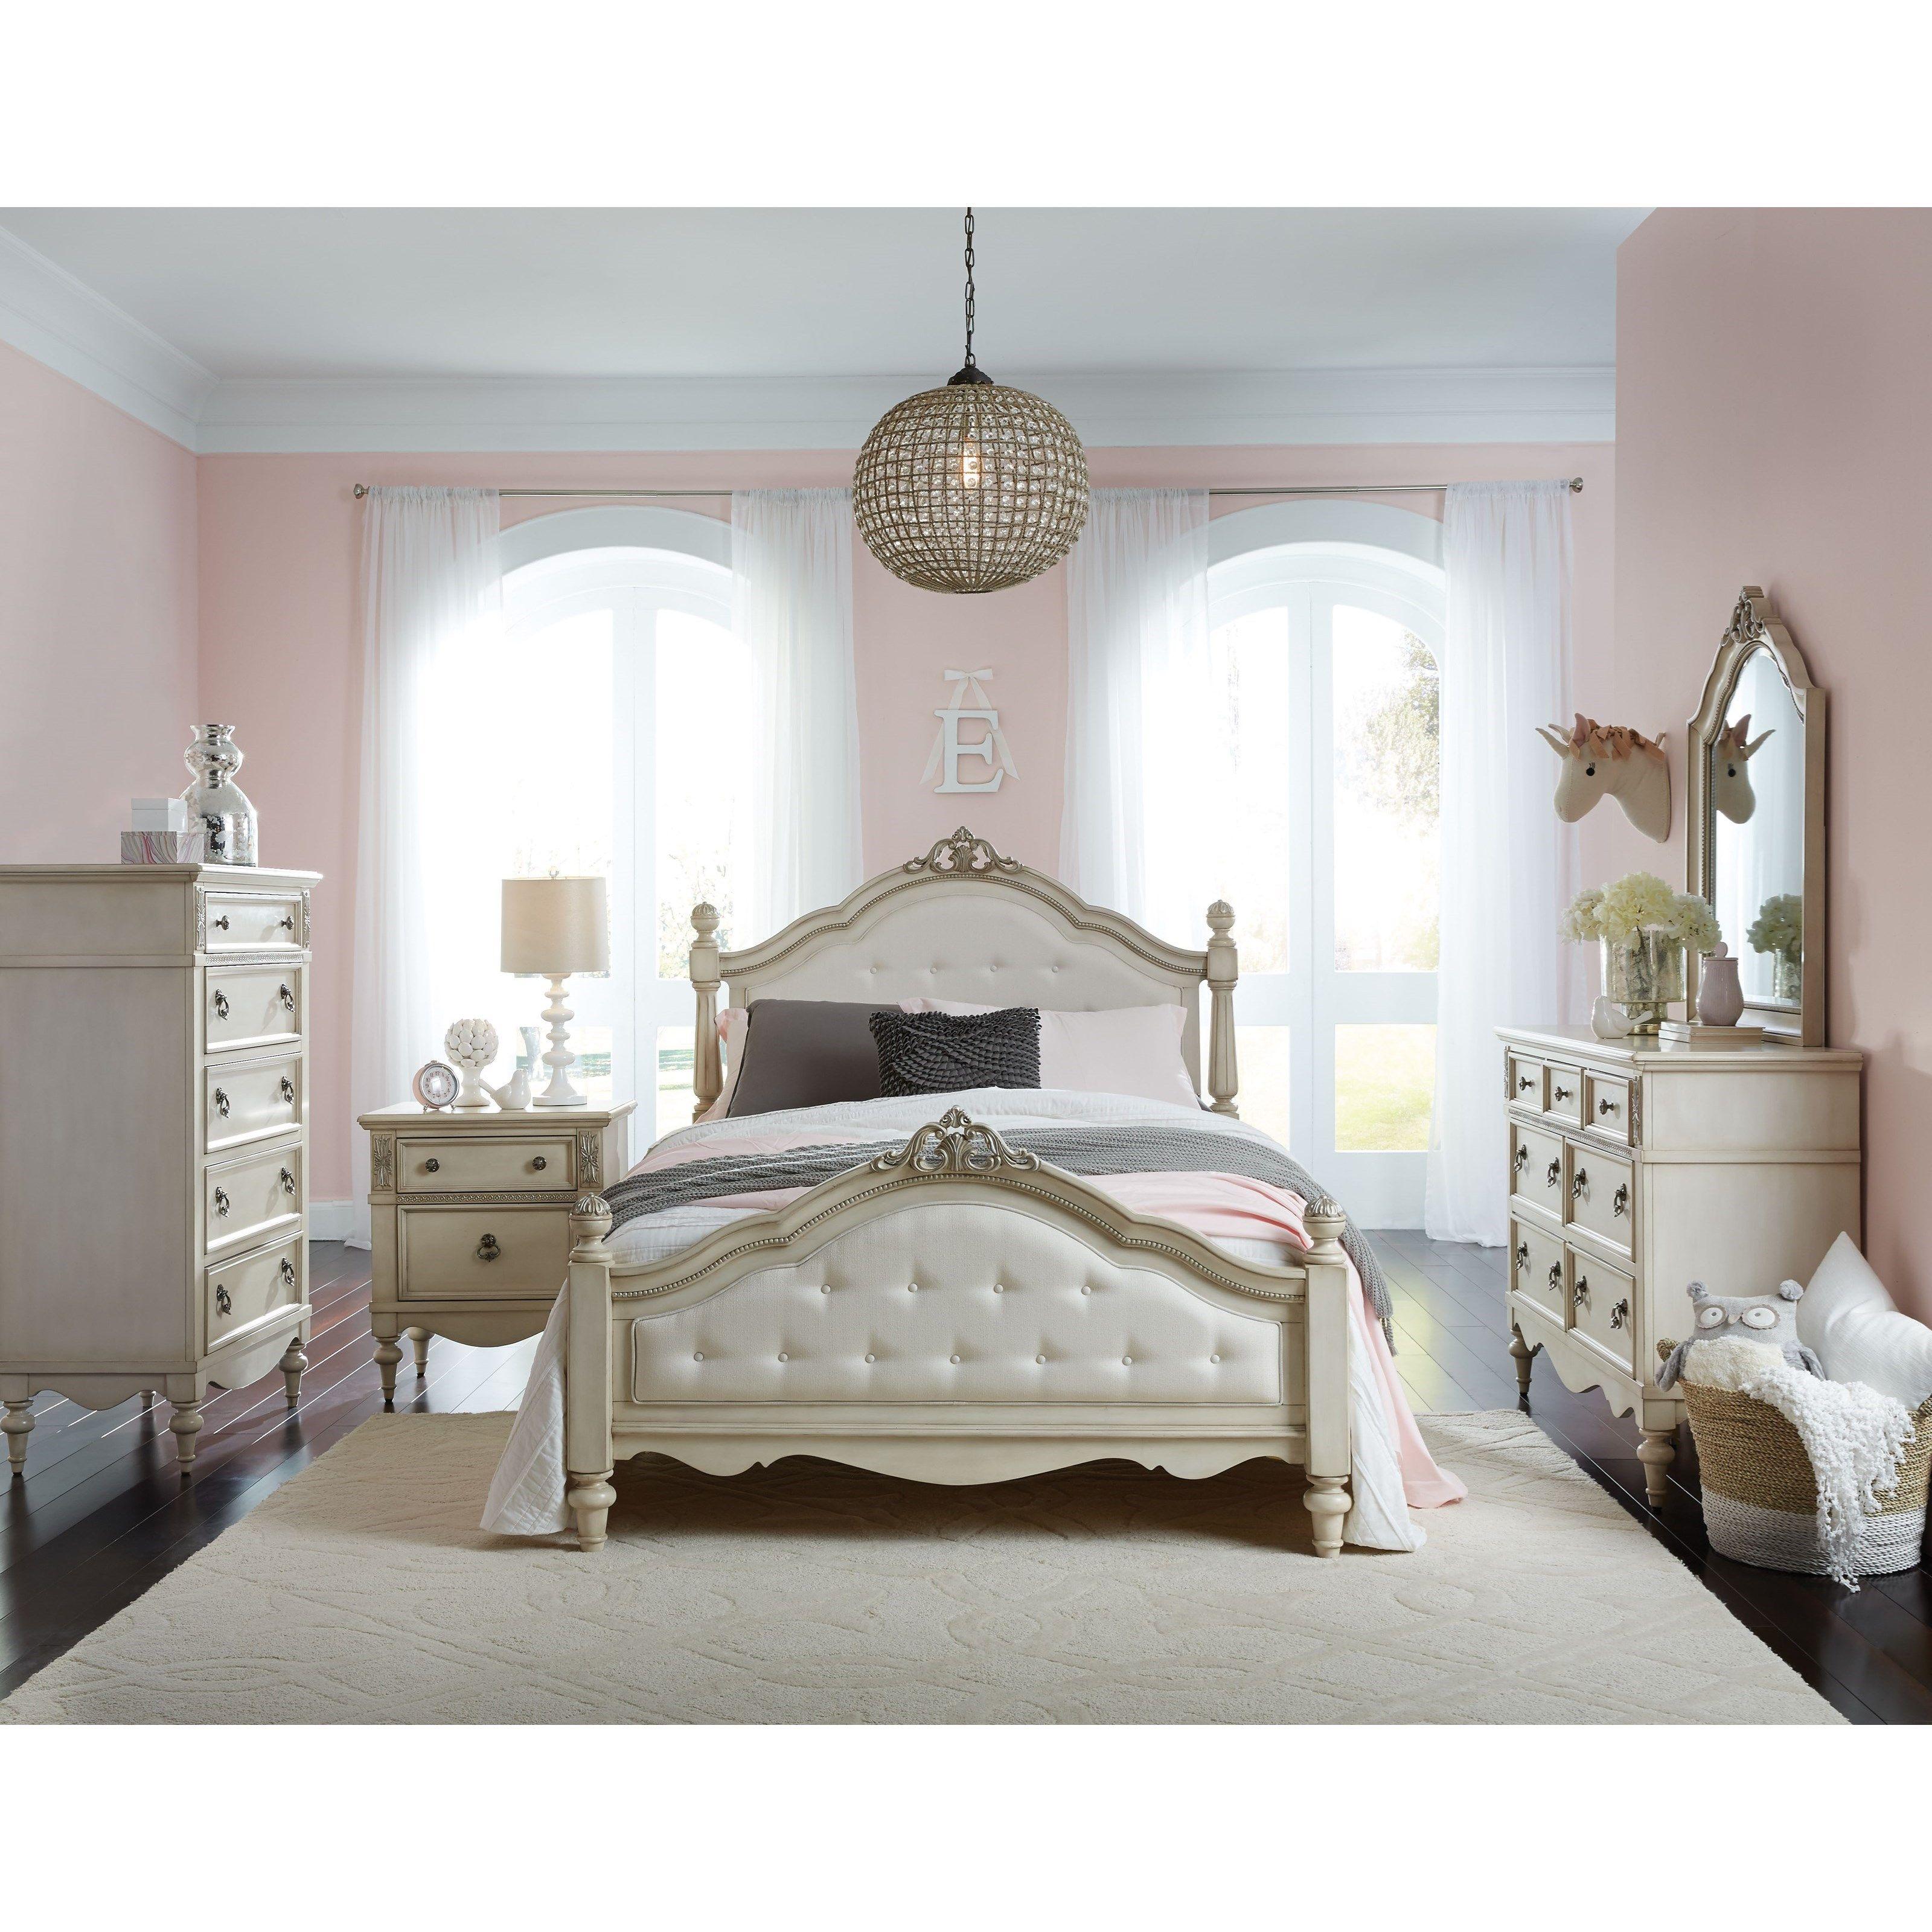 Giselle Full Bedroom Group By Standard Furniture At Miskelly Furniture Dorm Room Colors Girls Bedroom Green Bedroom Furniture Sets